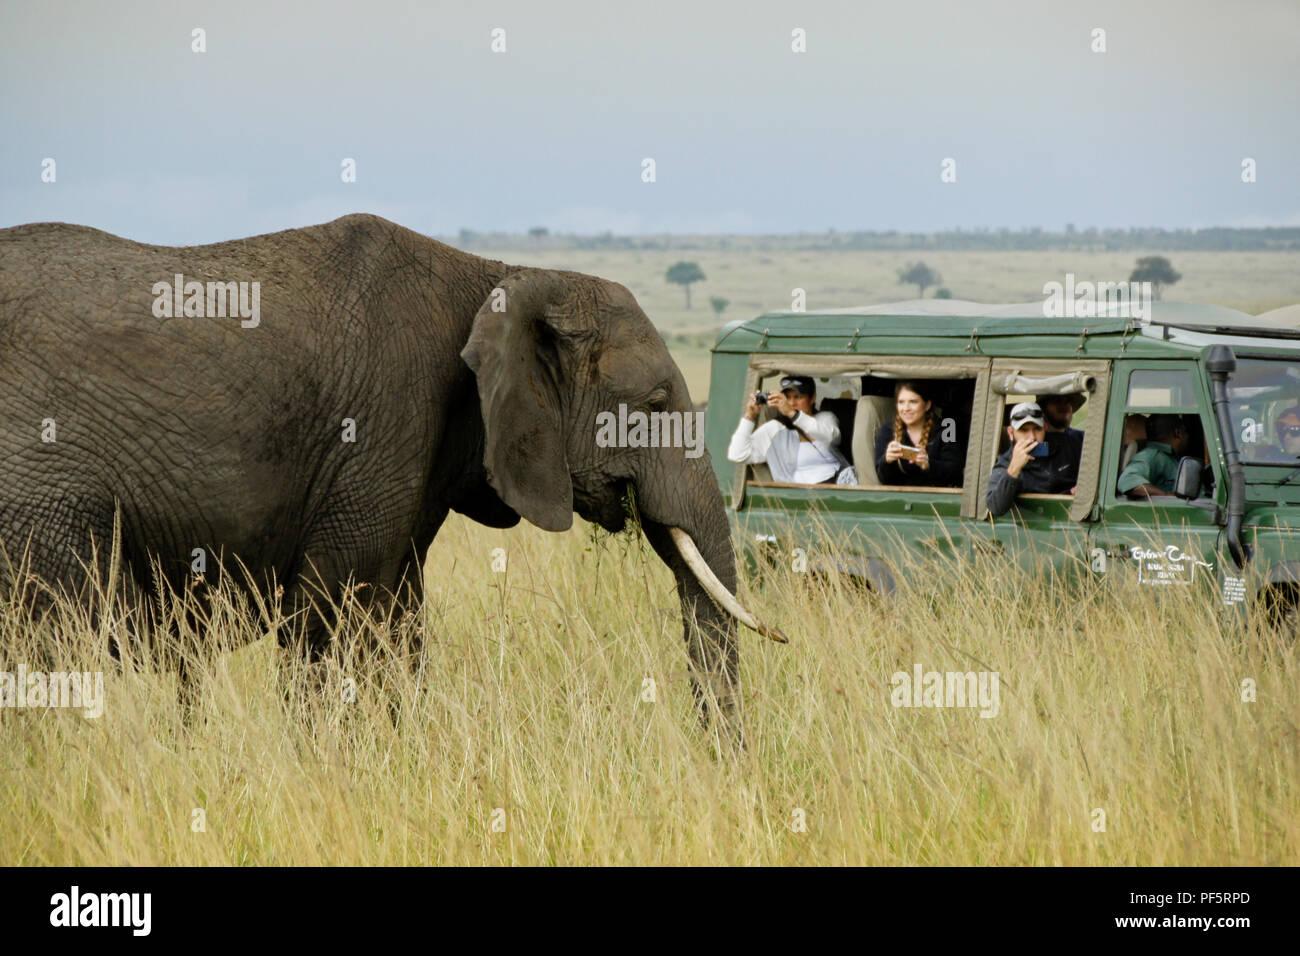 Tourists in safari vehicle photographing elephant up close, Masai Mara Game Reserve, Kenya Stock Photo